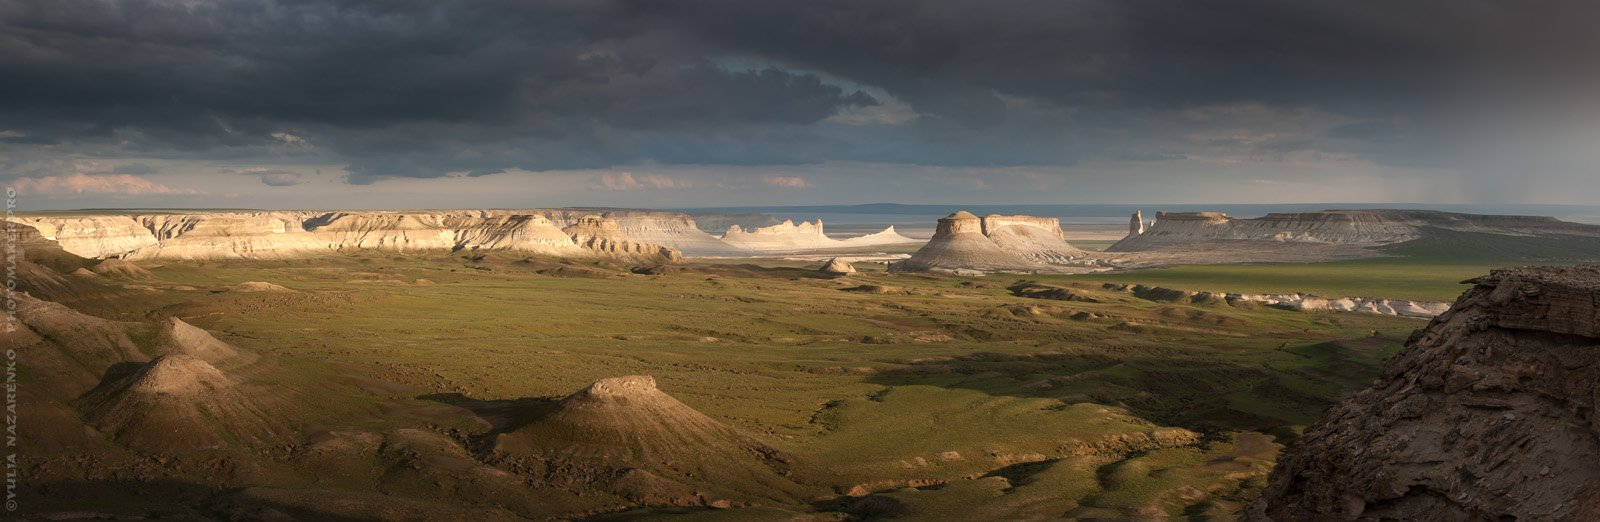 пейзаж, панорама, ландшафт, необычный, Казахстан, Бозжира, landscape, panorama, Юлия Назаренко